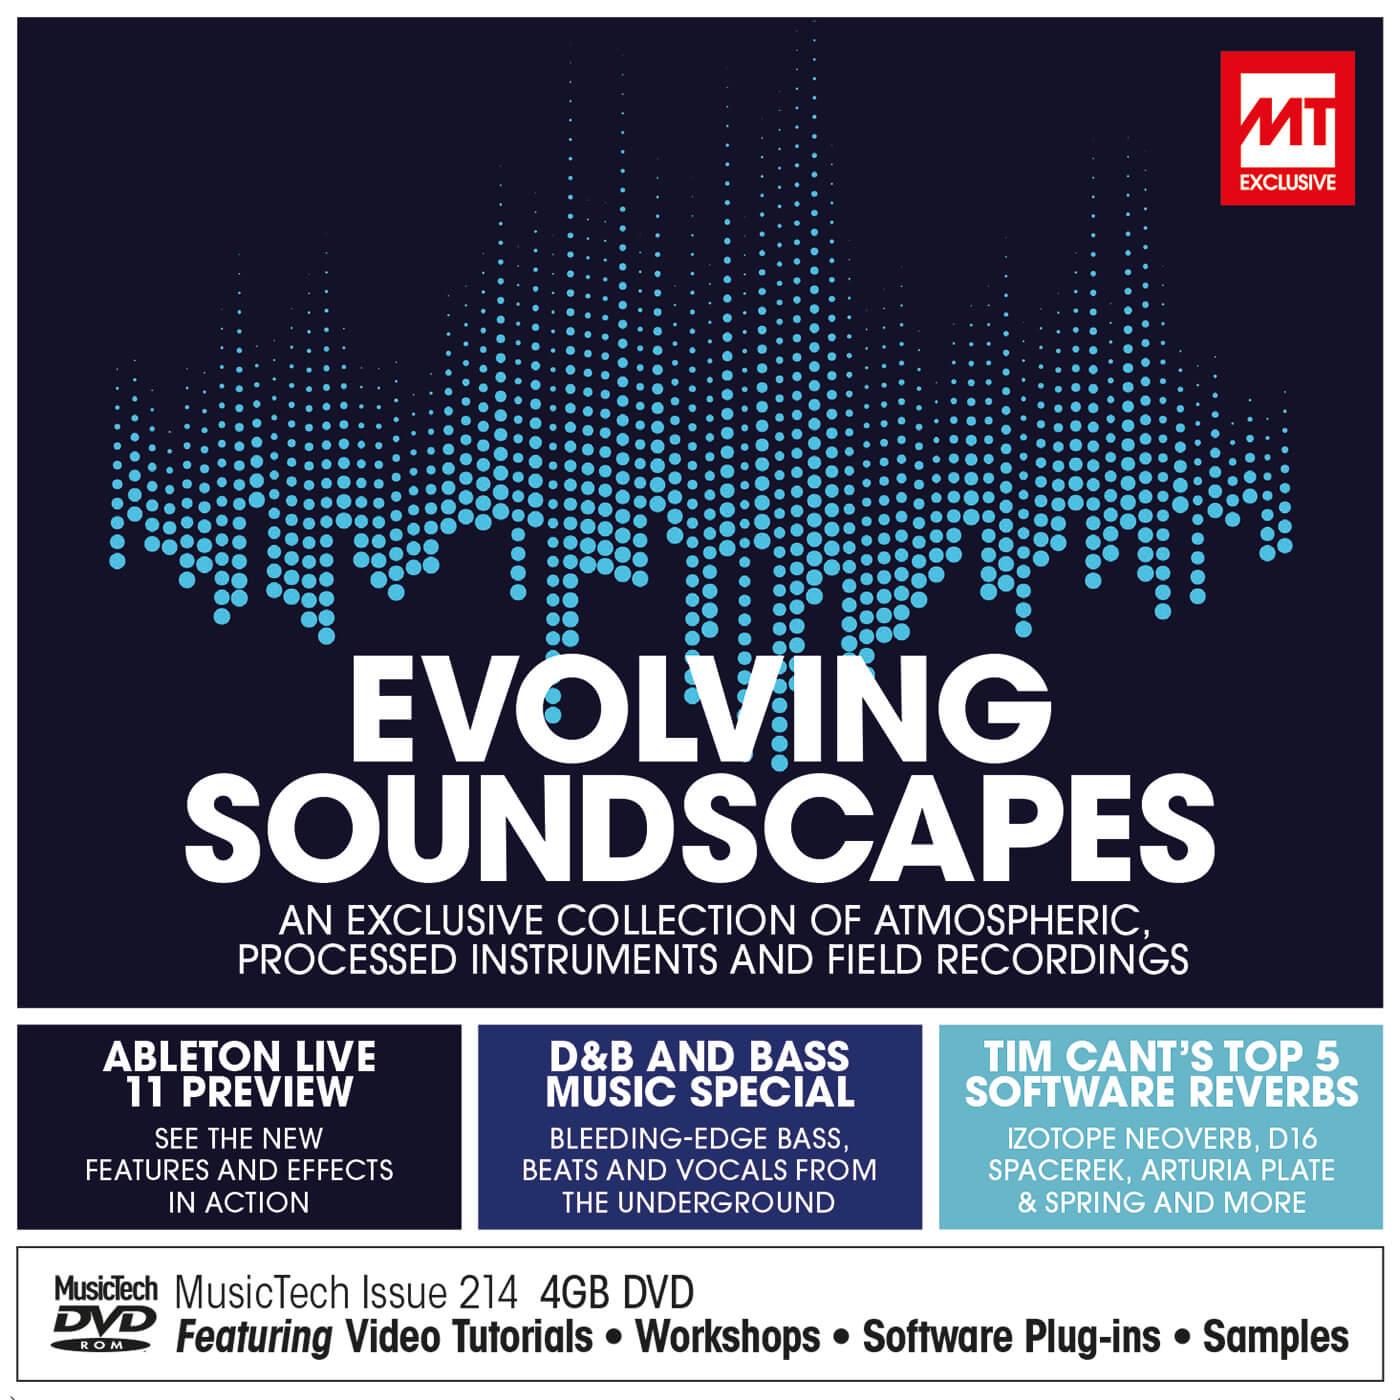 MusicTech Issue 214